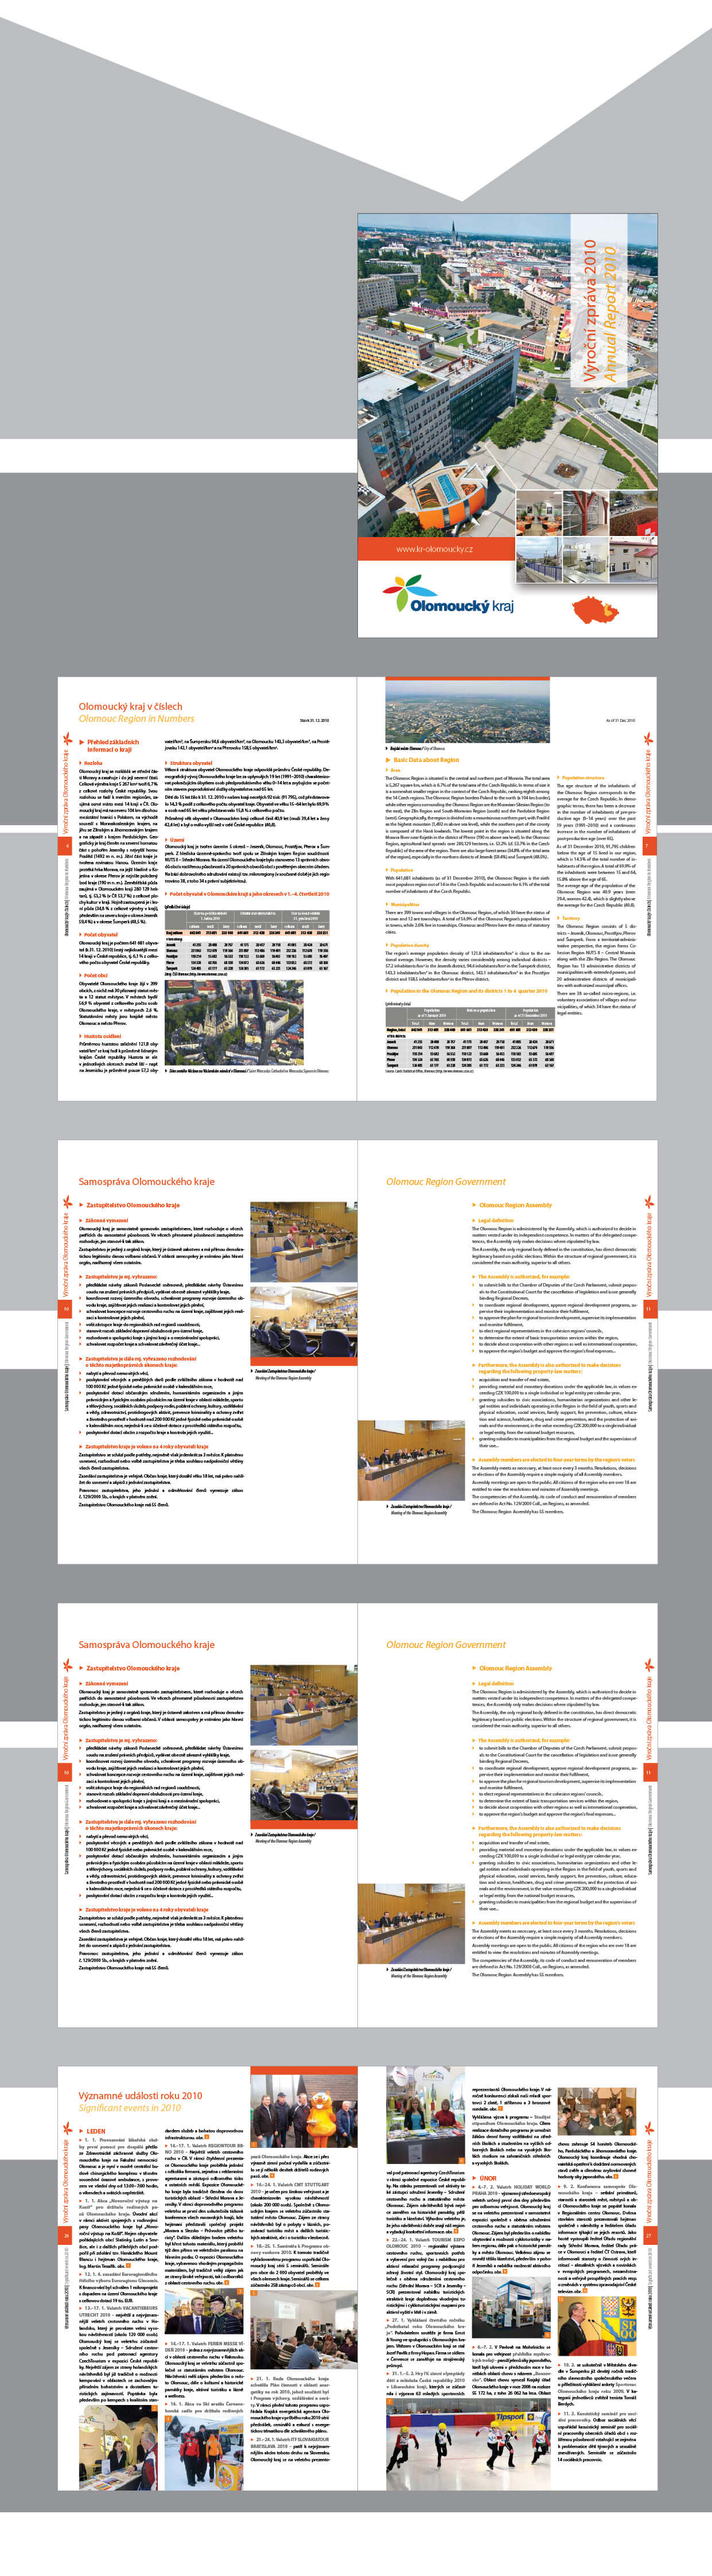 vyrocni-zprava-grafika-design